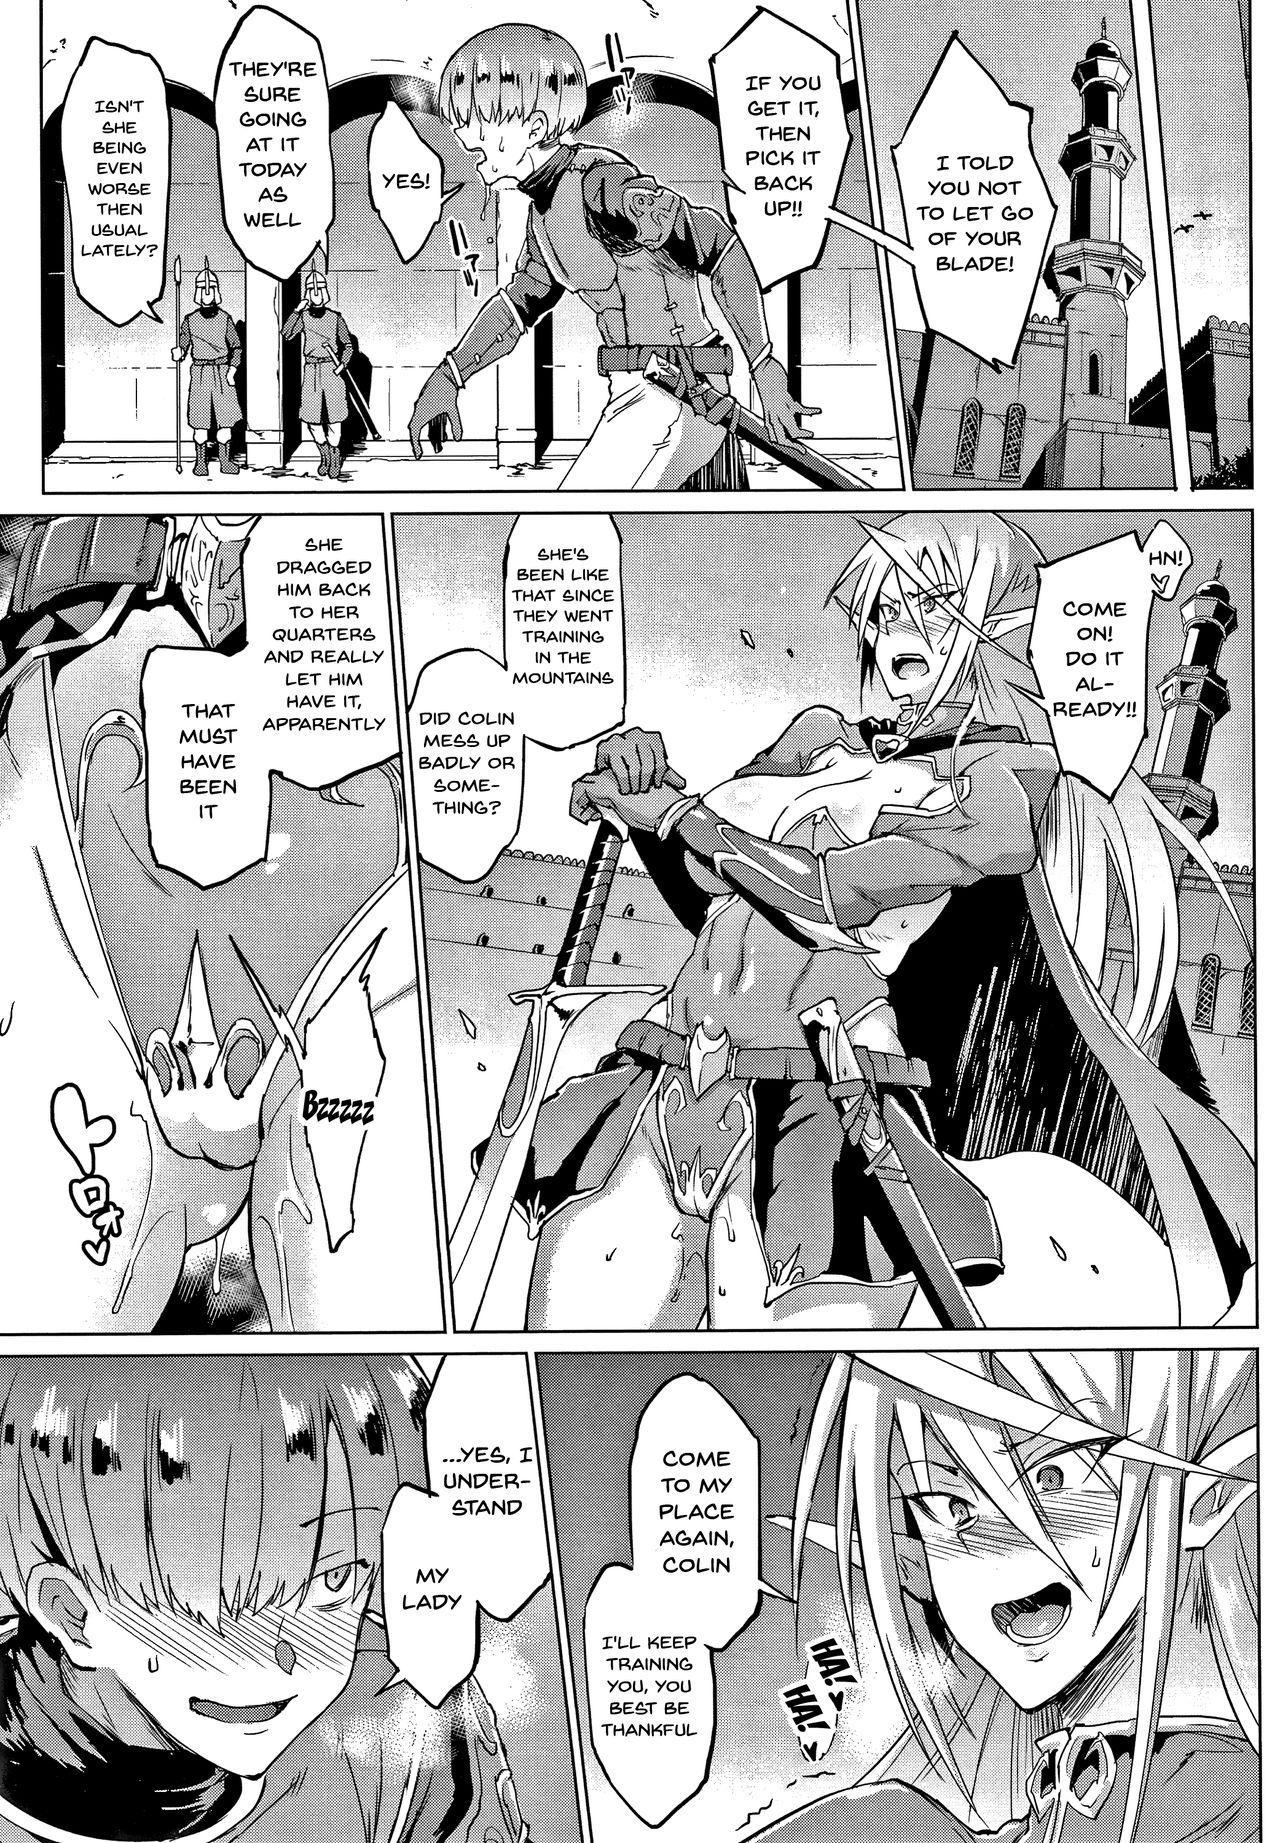 [Fan no Hitori] Sennen Reijou ~My Lady, My Master~  Ch.1-6 [English] {Doujins.com} 29